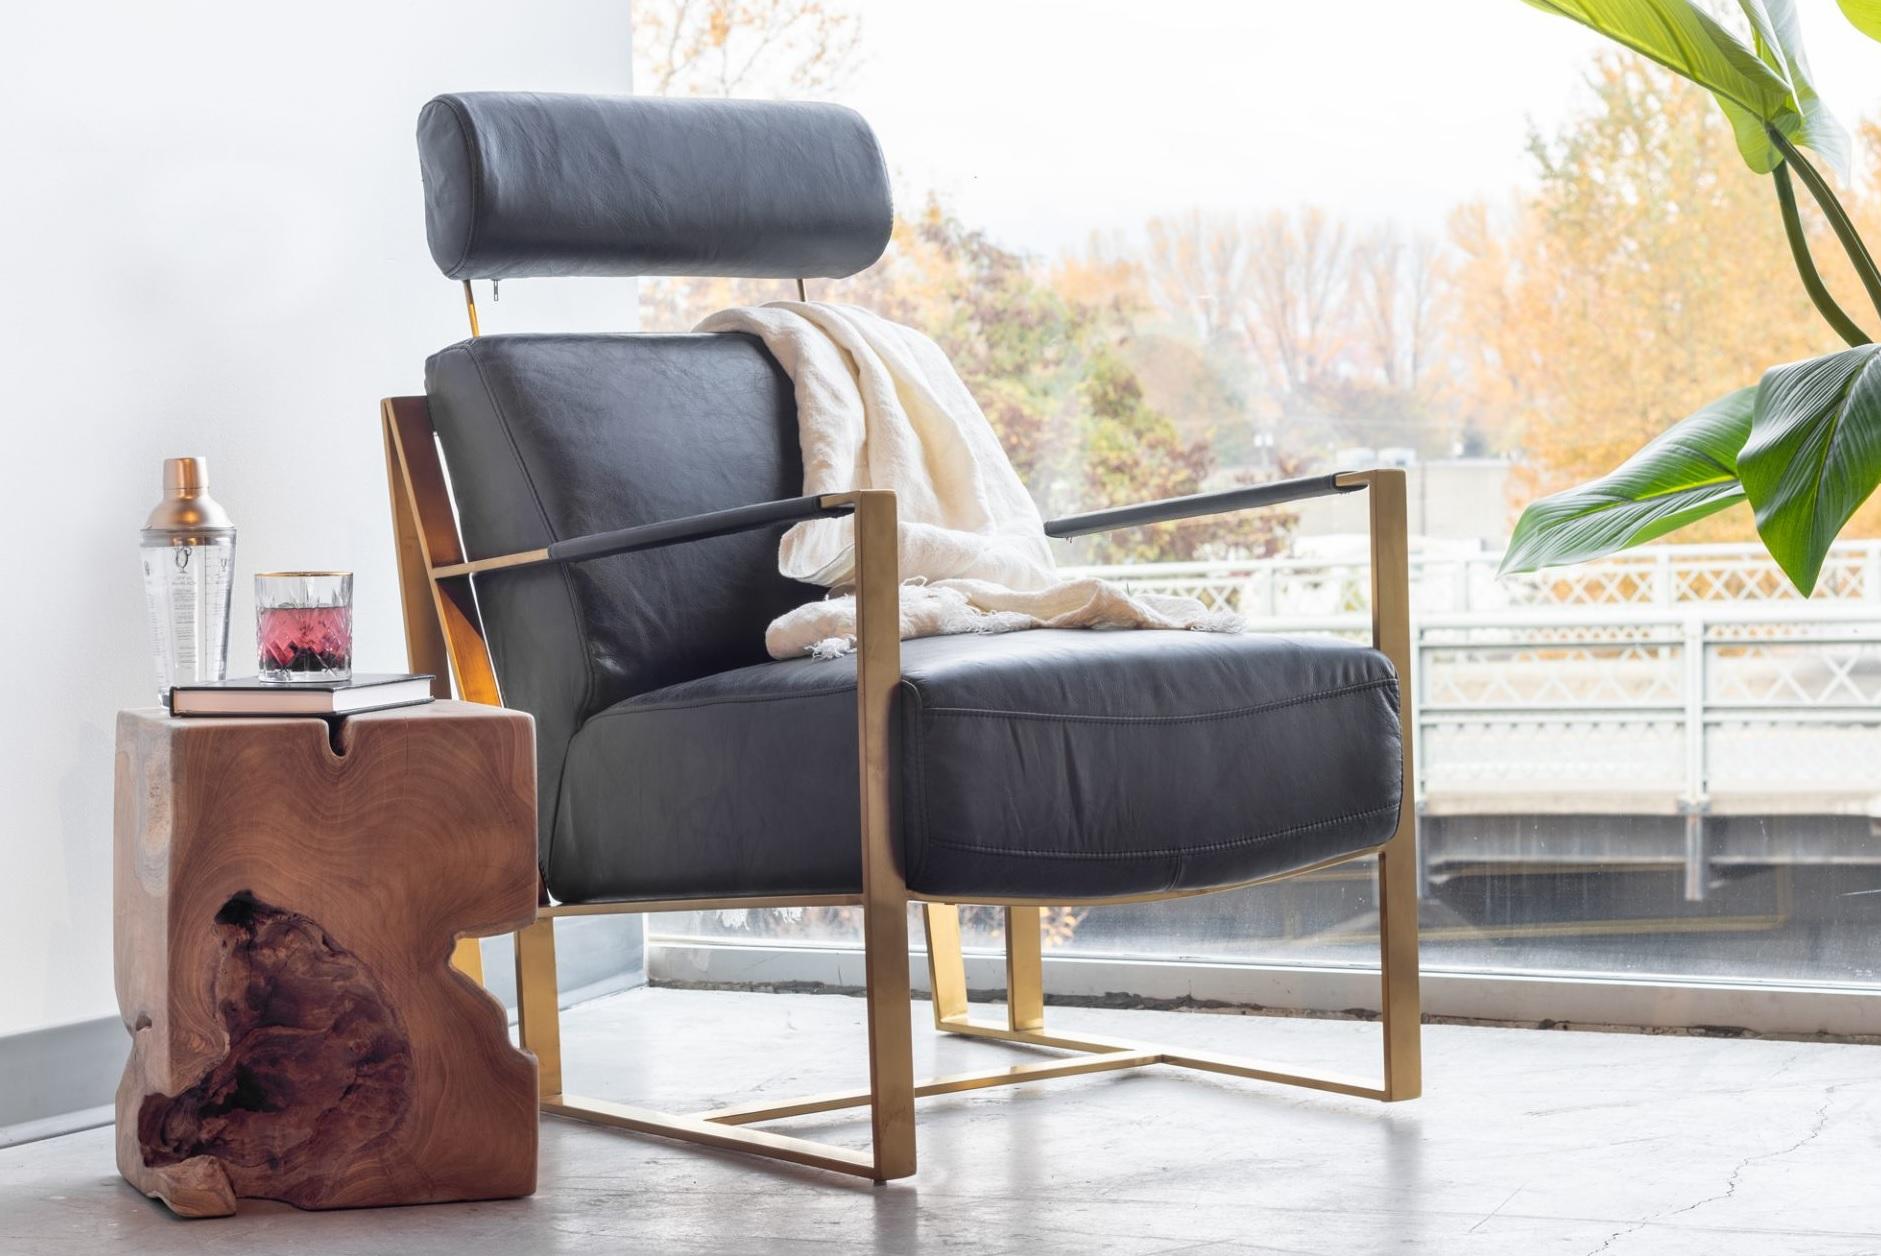 Paradiso Black Leather Accent Chair Las Vegas Furniture Store Modern Home Furniture Cornerstone Furniture